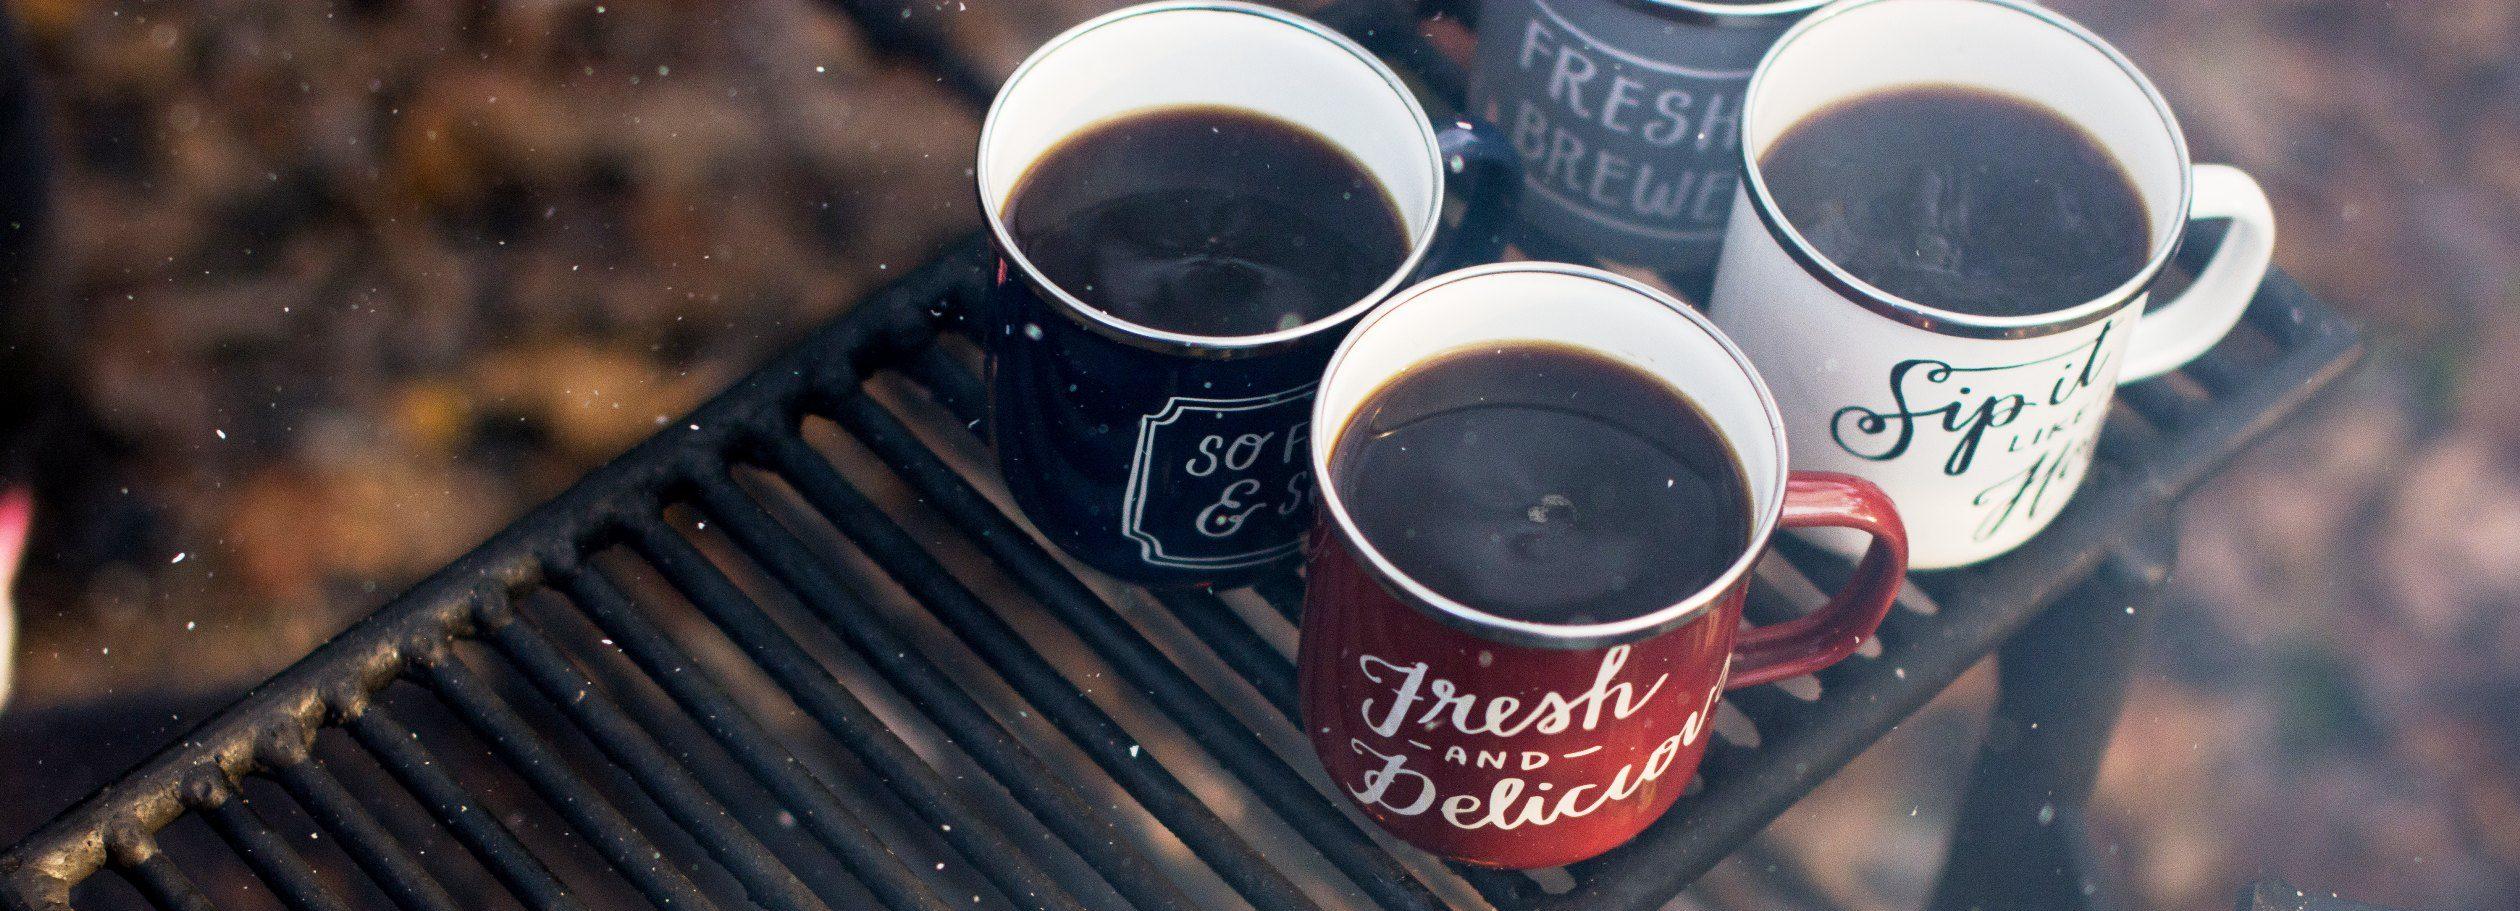 cropped-coffeecups2-25.jpg